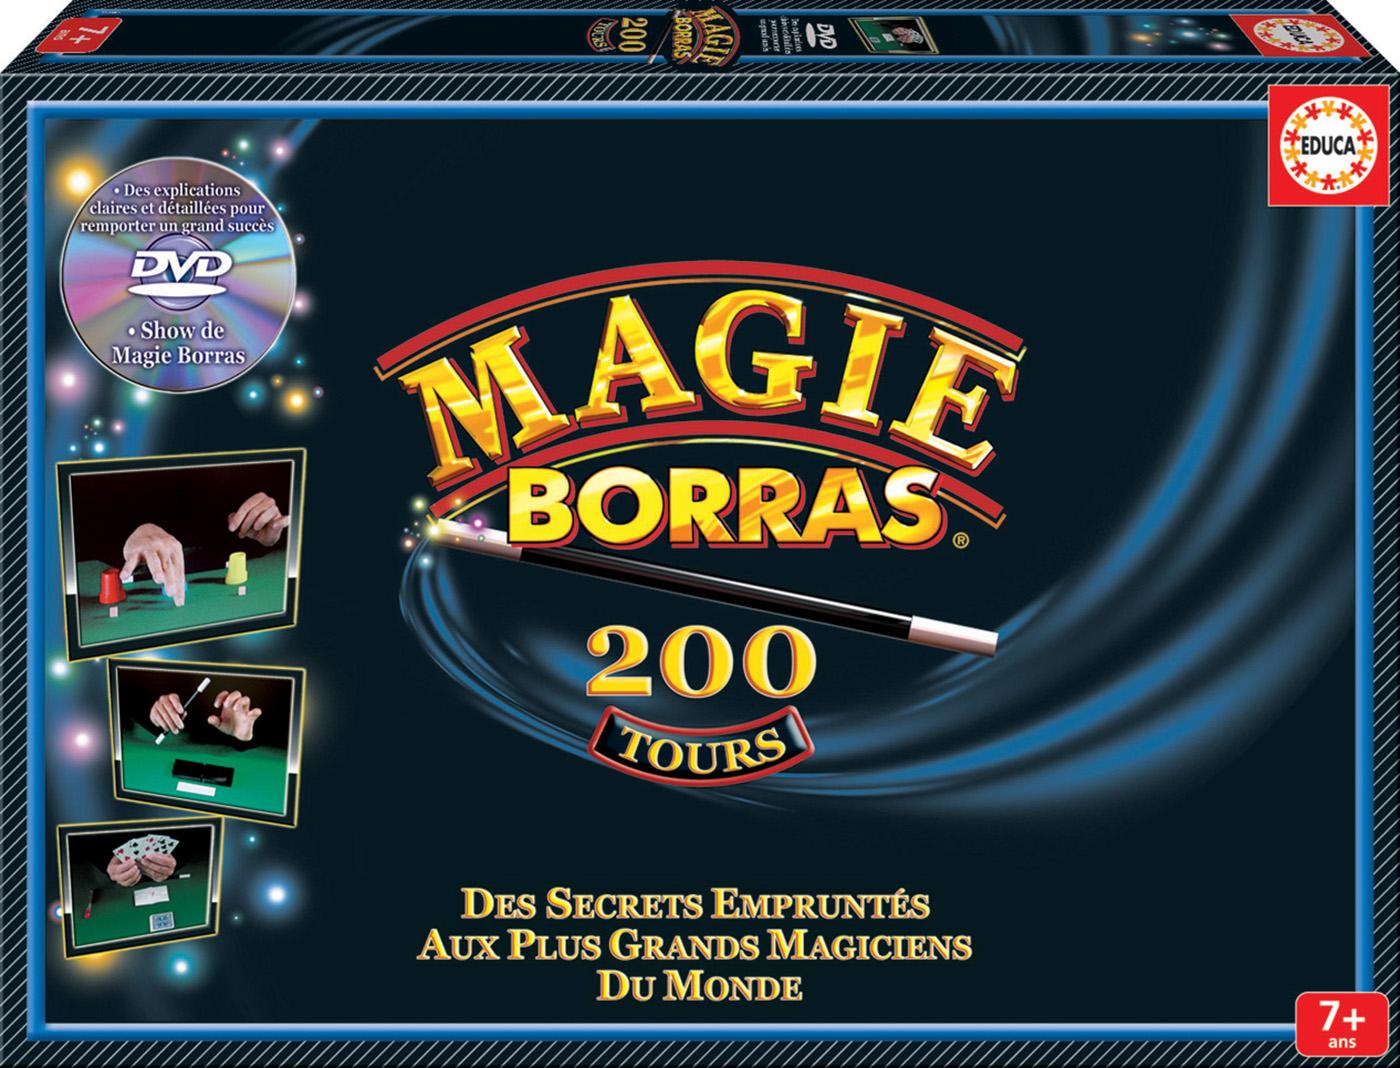 Magie Borras ® 200 tours